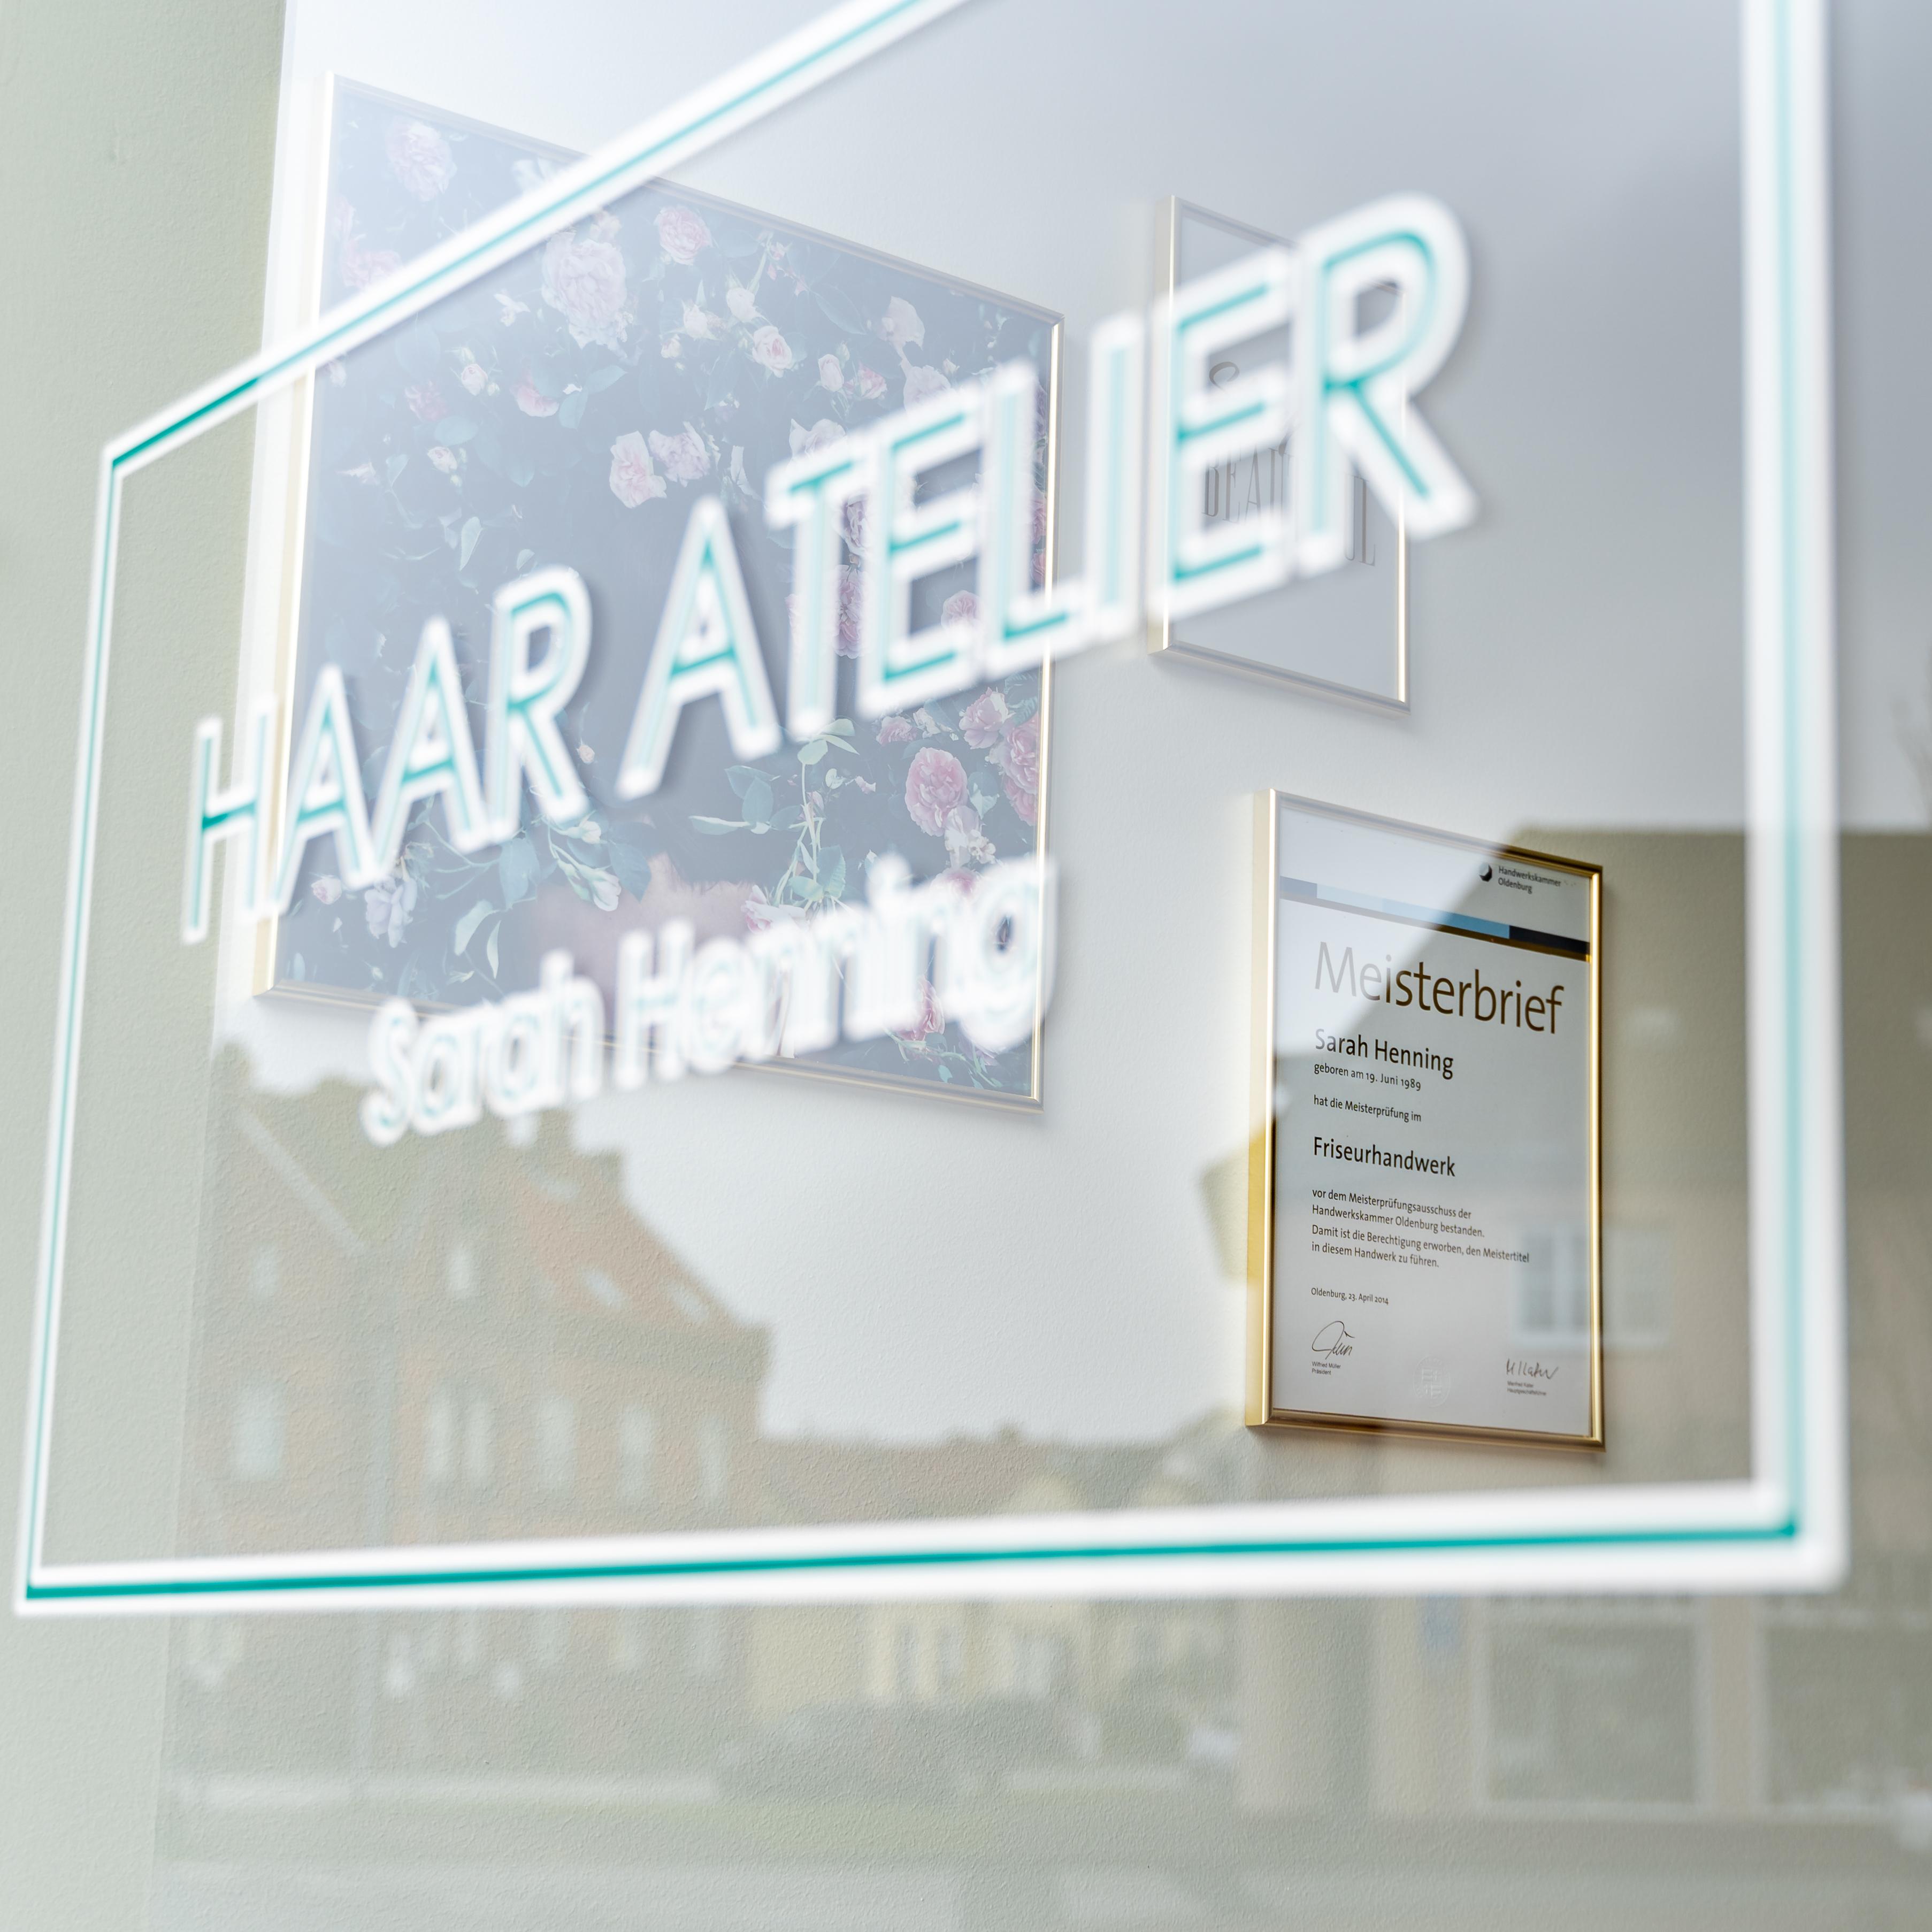 Haar+Atelier+Sarah+Henning+(1).jpg